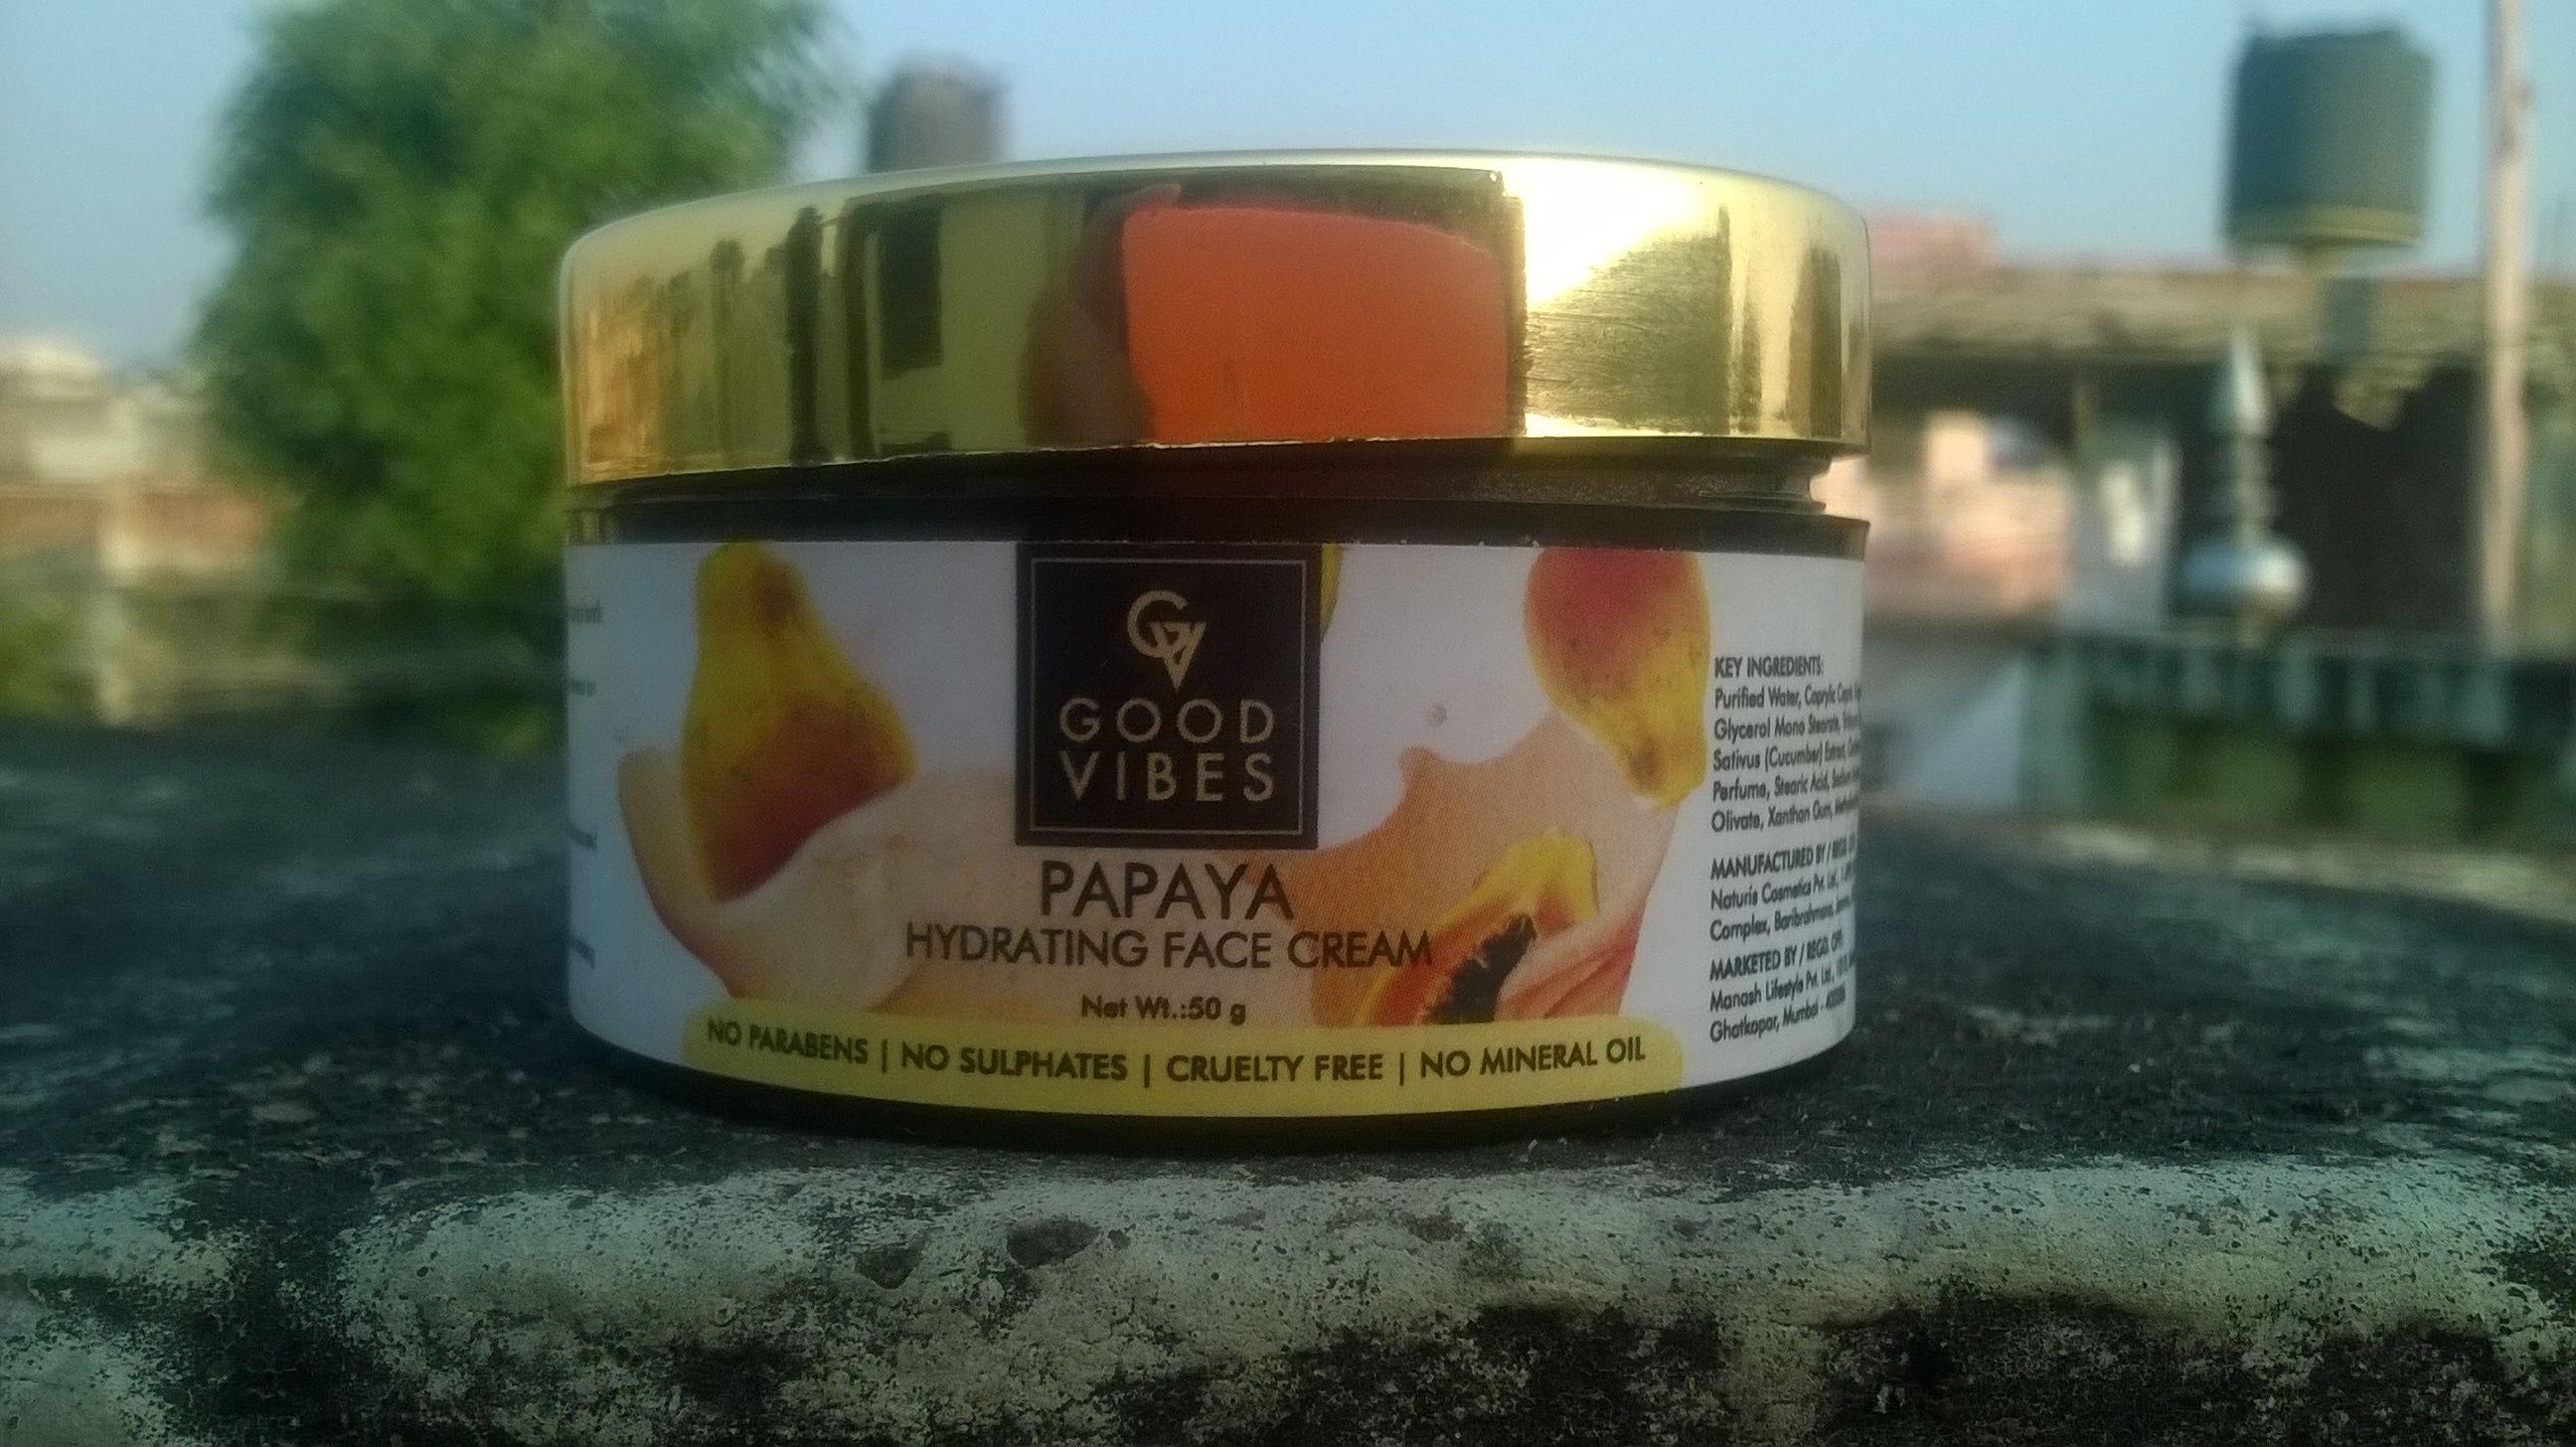 Good Vibes Papaya Hydrating Face Cream Hydrating Face Cream